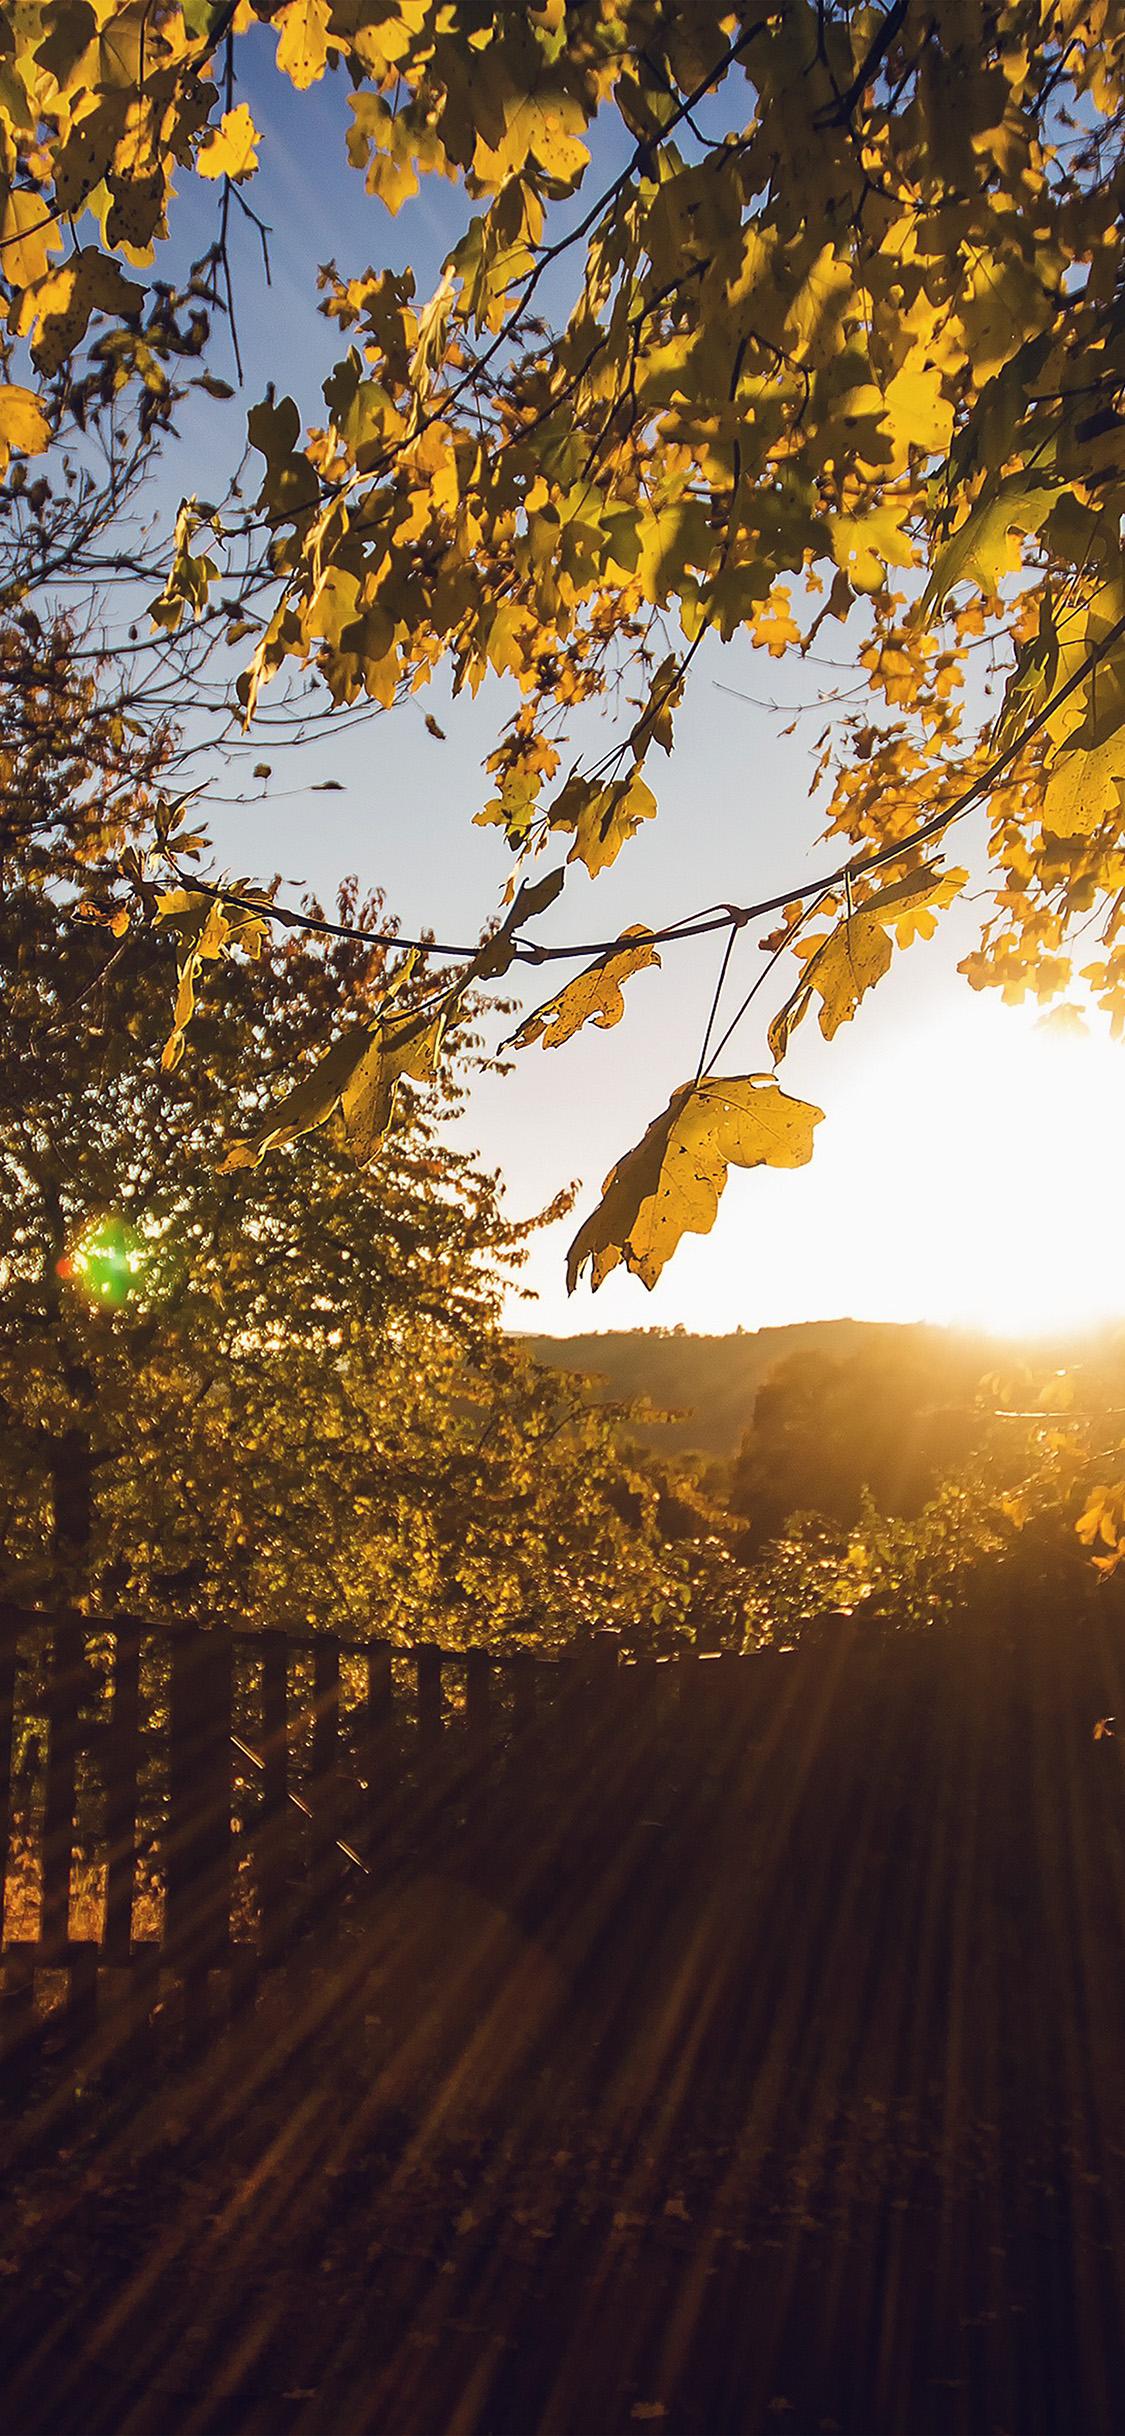 Nw22 Morning Sunlight Fall Nature Wallpaper